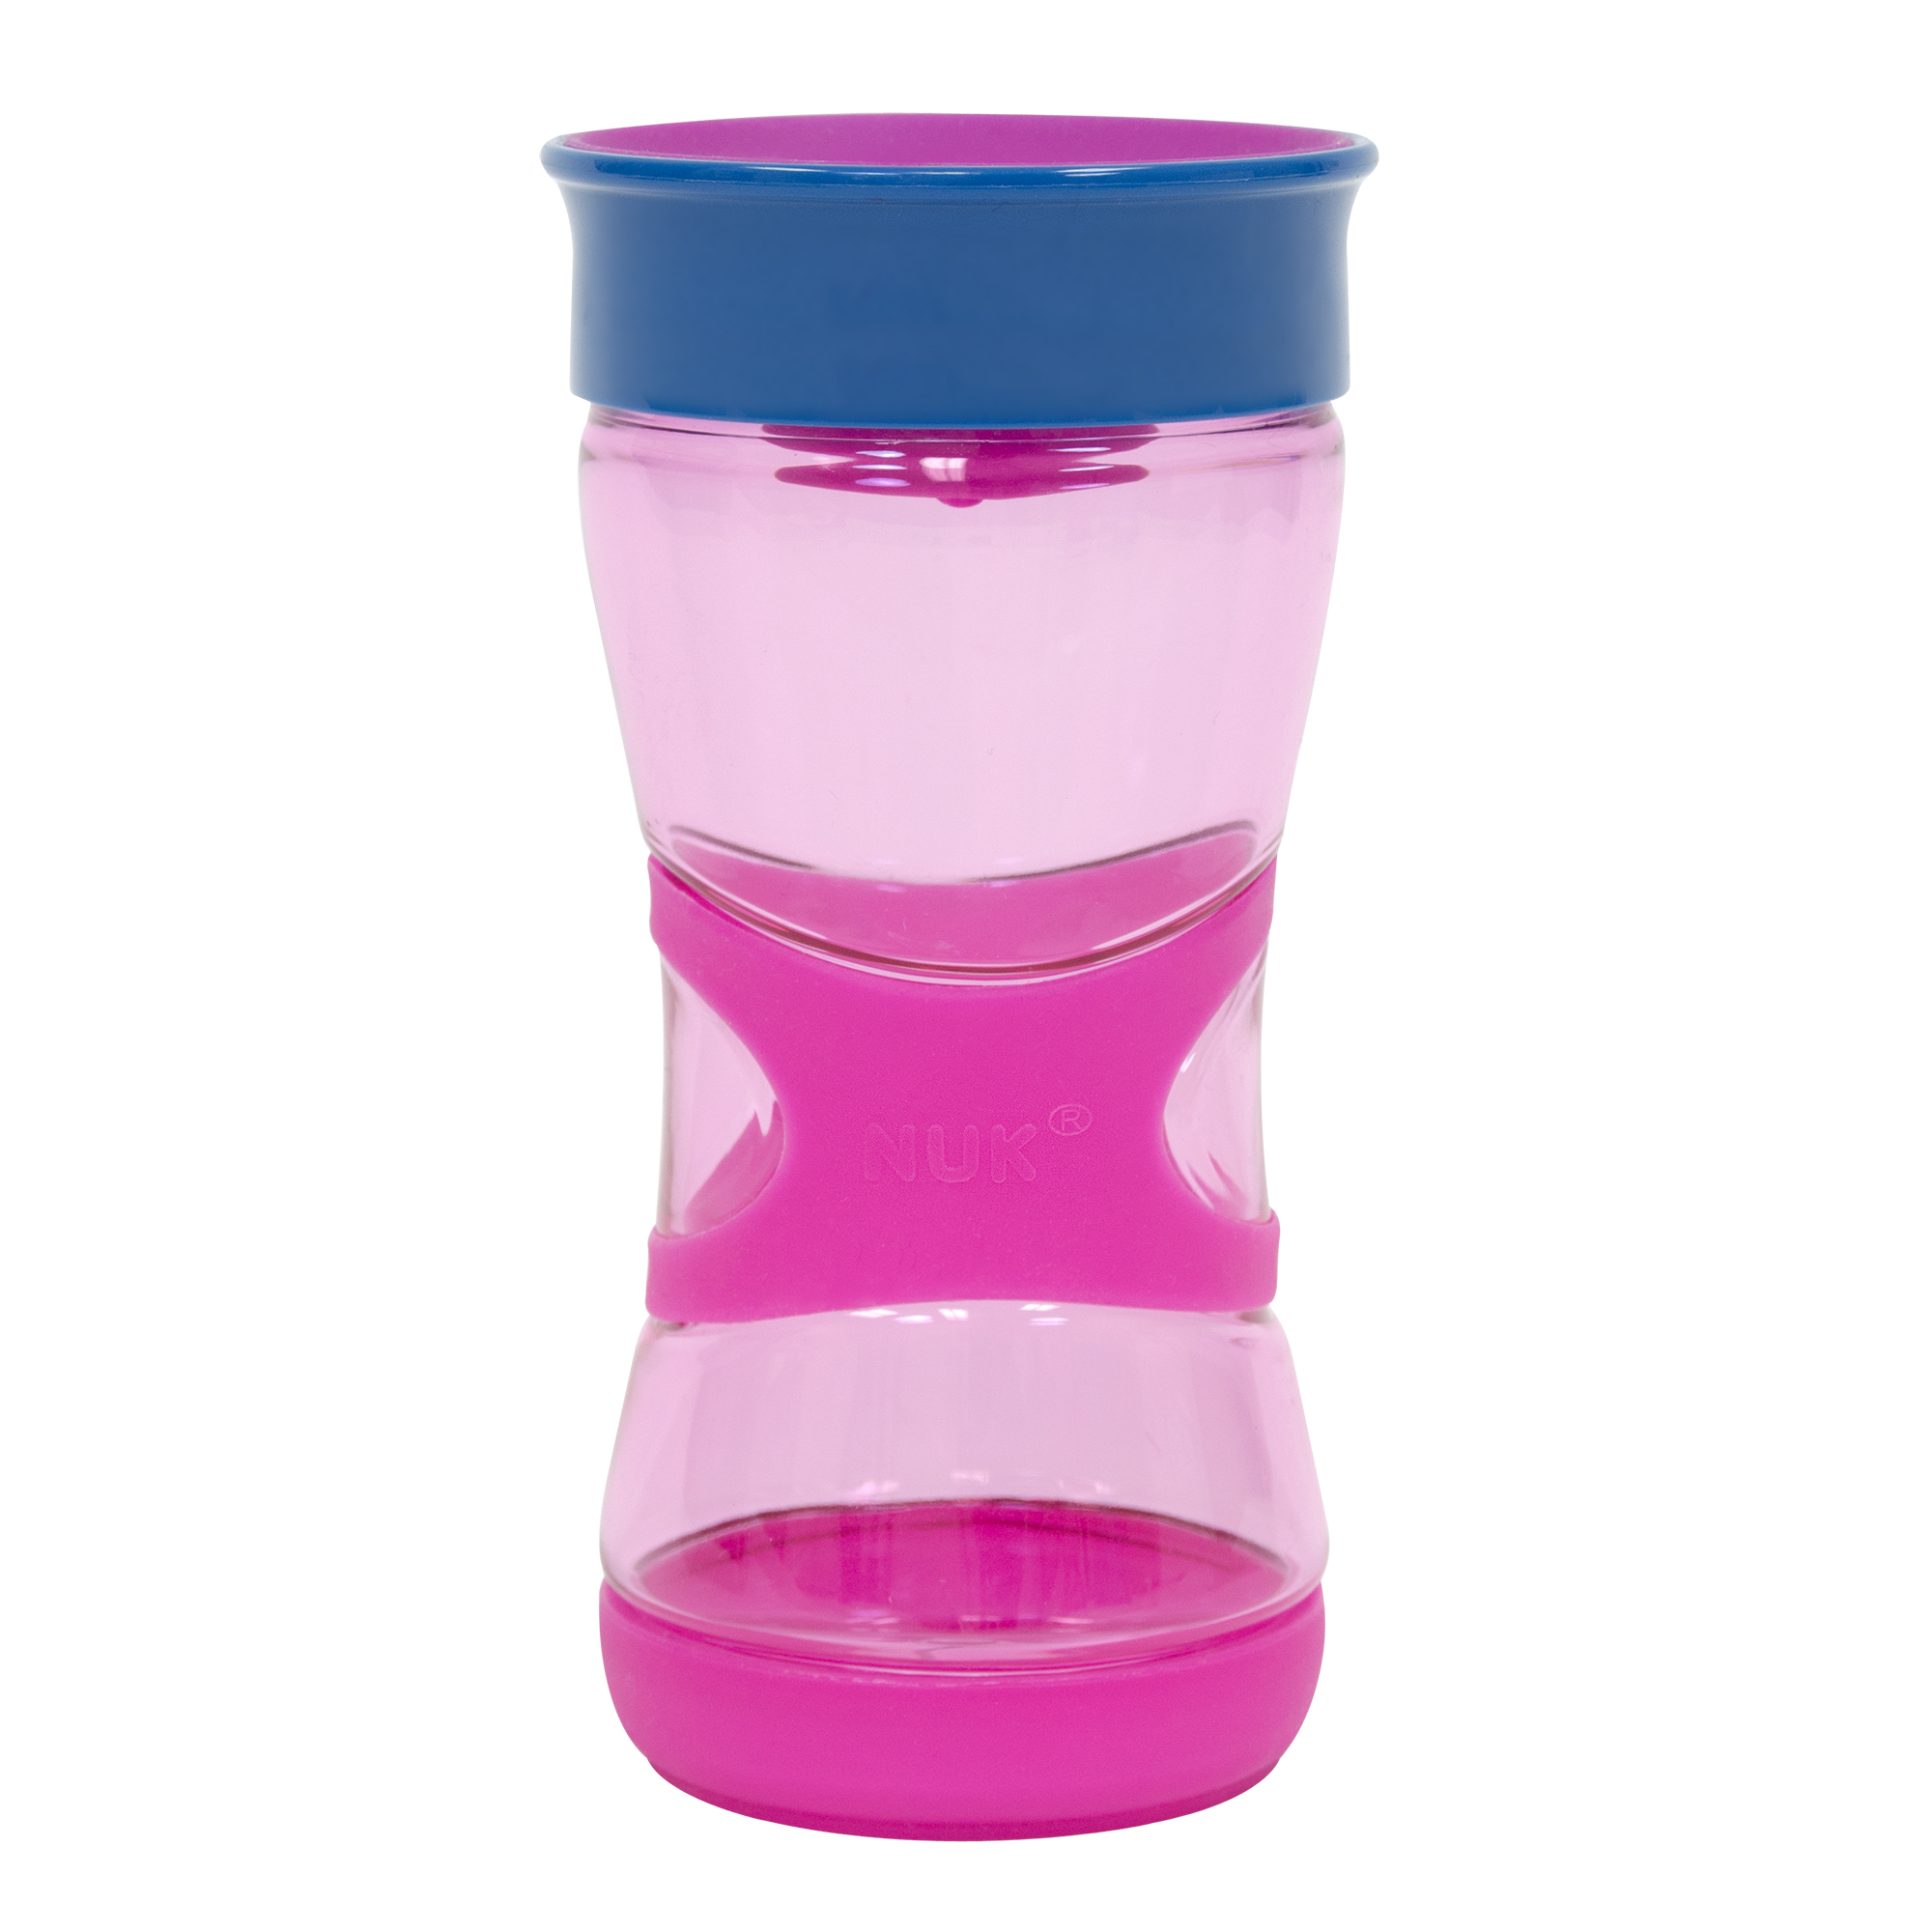 NUK Kids Magic 360 Rim Ultra Grip Cup,13 ounce, 1-pack, pink